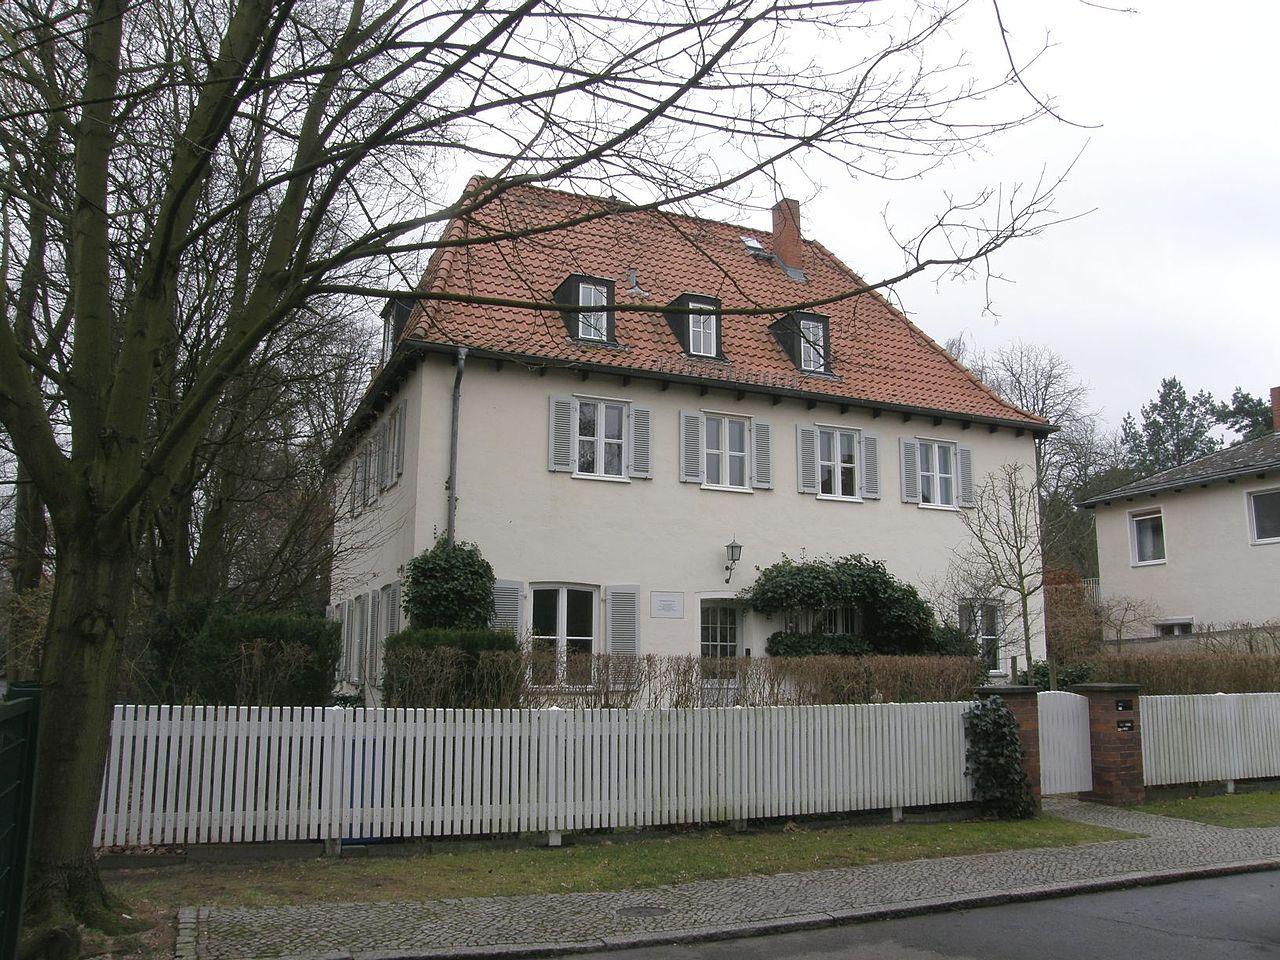 Bild Bonhoeffer Haus Berlin